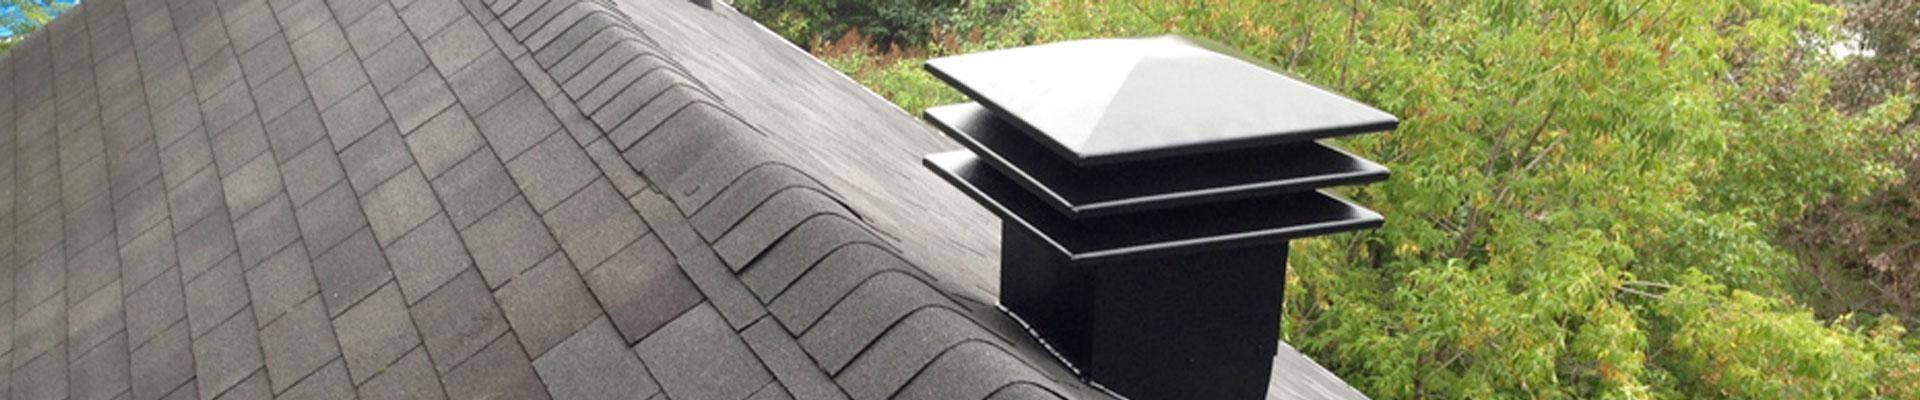 ventilation et isolation de l entretoit toiture deluxe. Black Bedroom Furniture Sets. Home Design Ideas